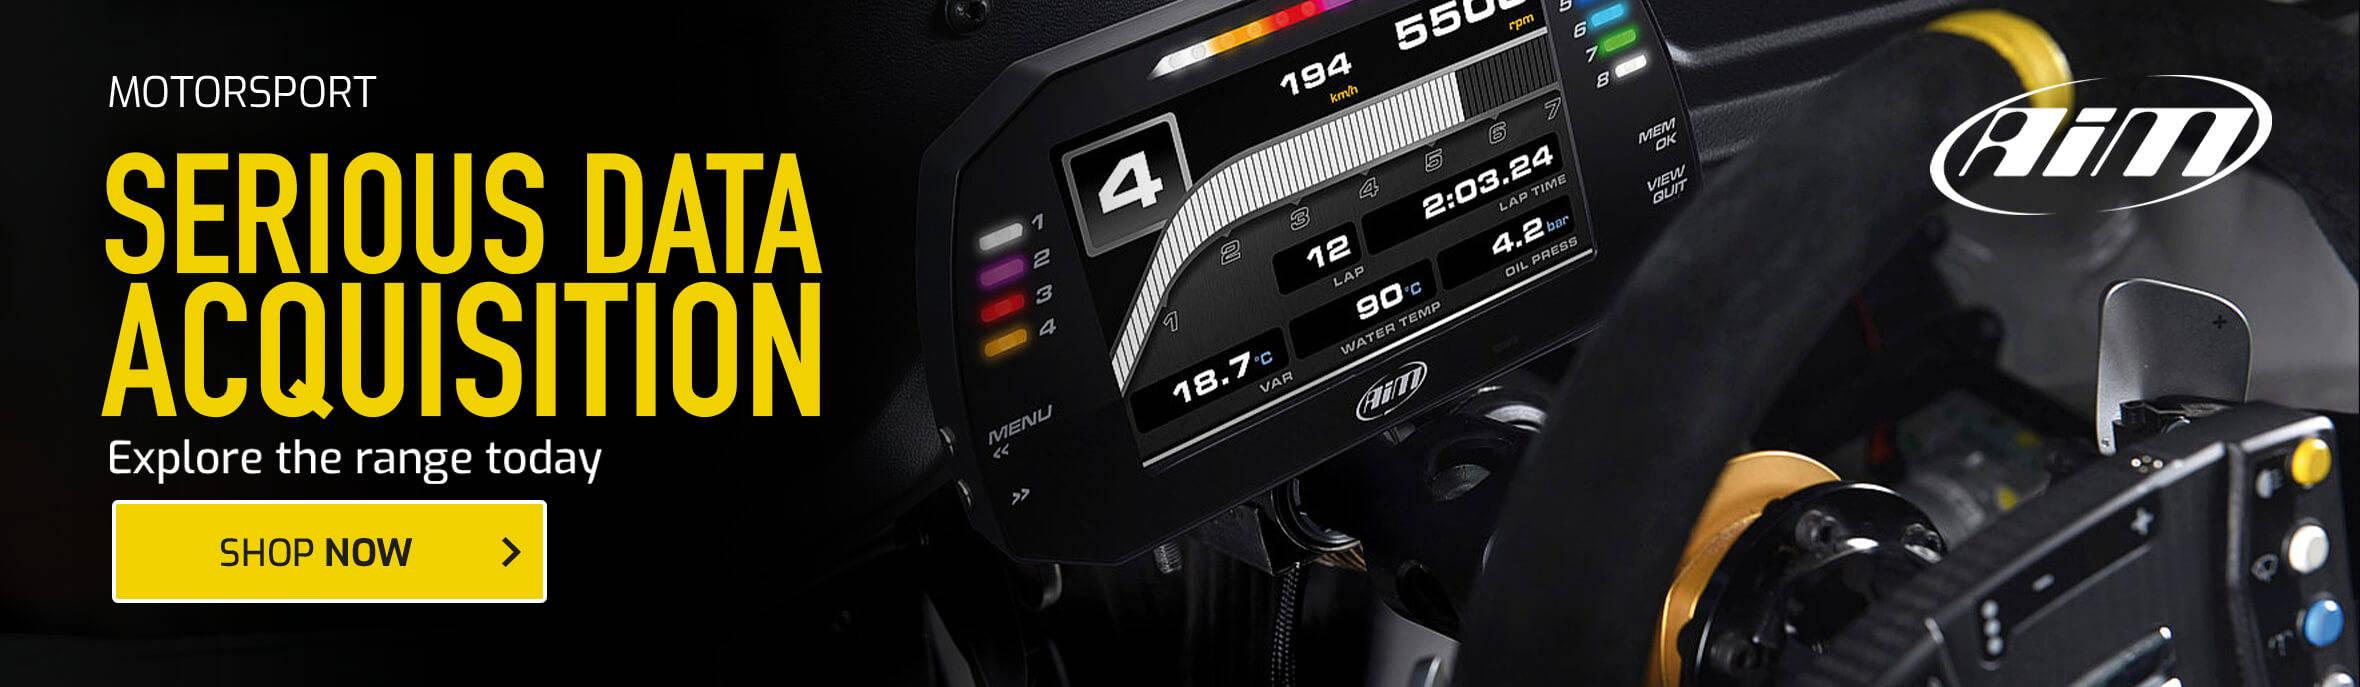 AIM Motorsport - Serious Data Acquisition